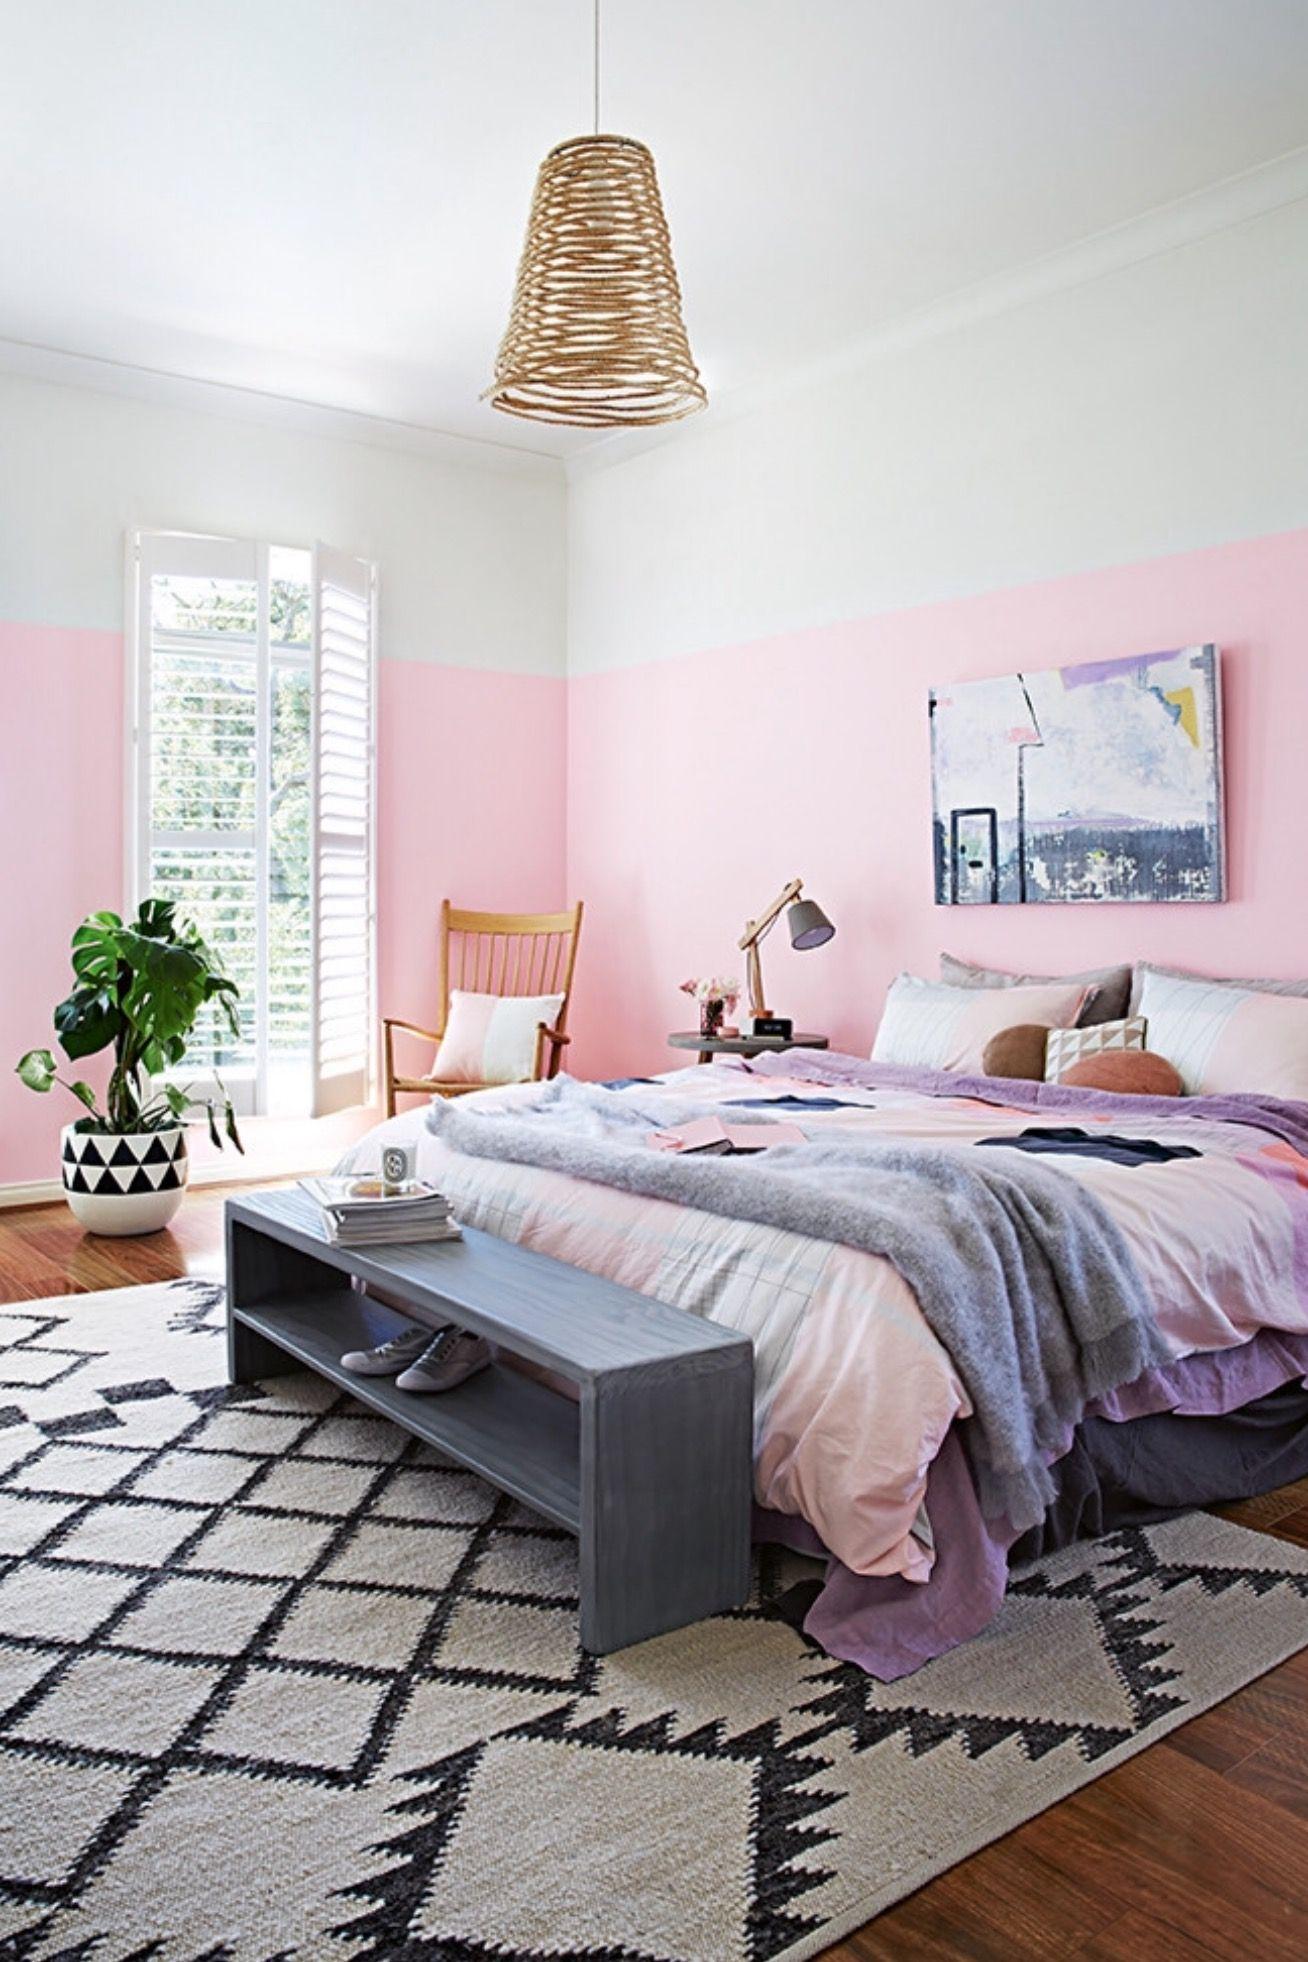 half painted walls | interior design | Pinterest